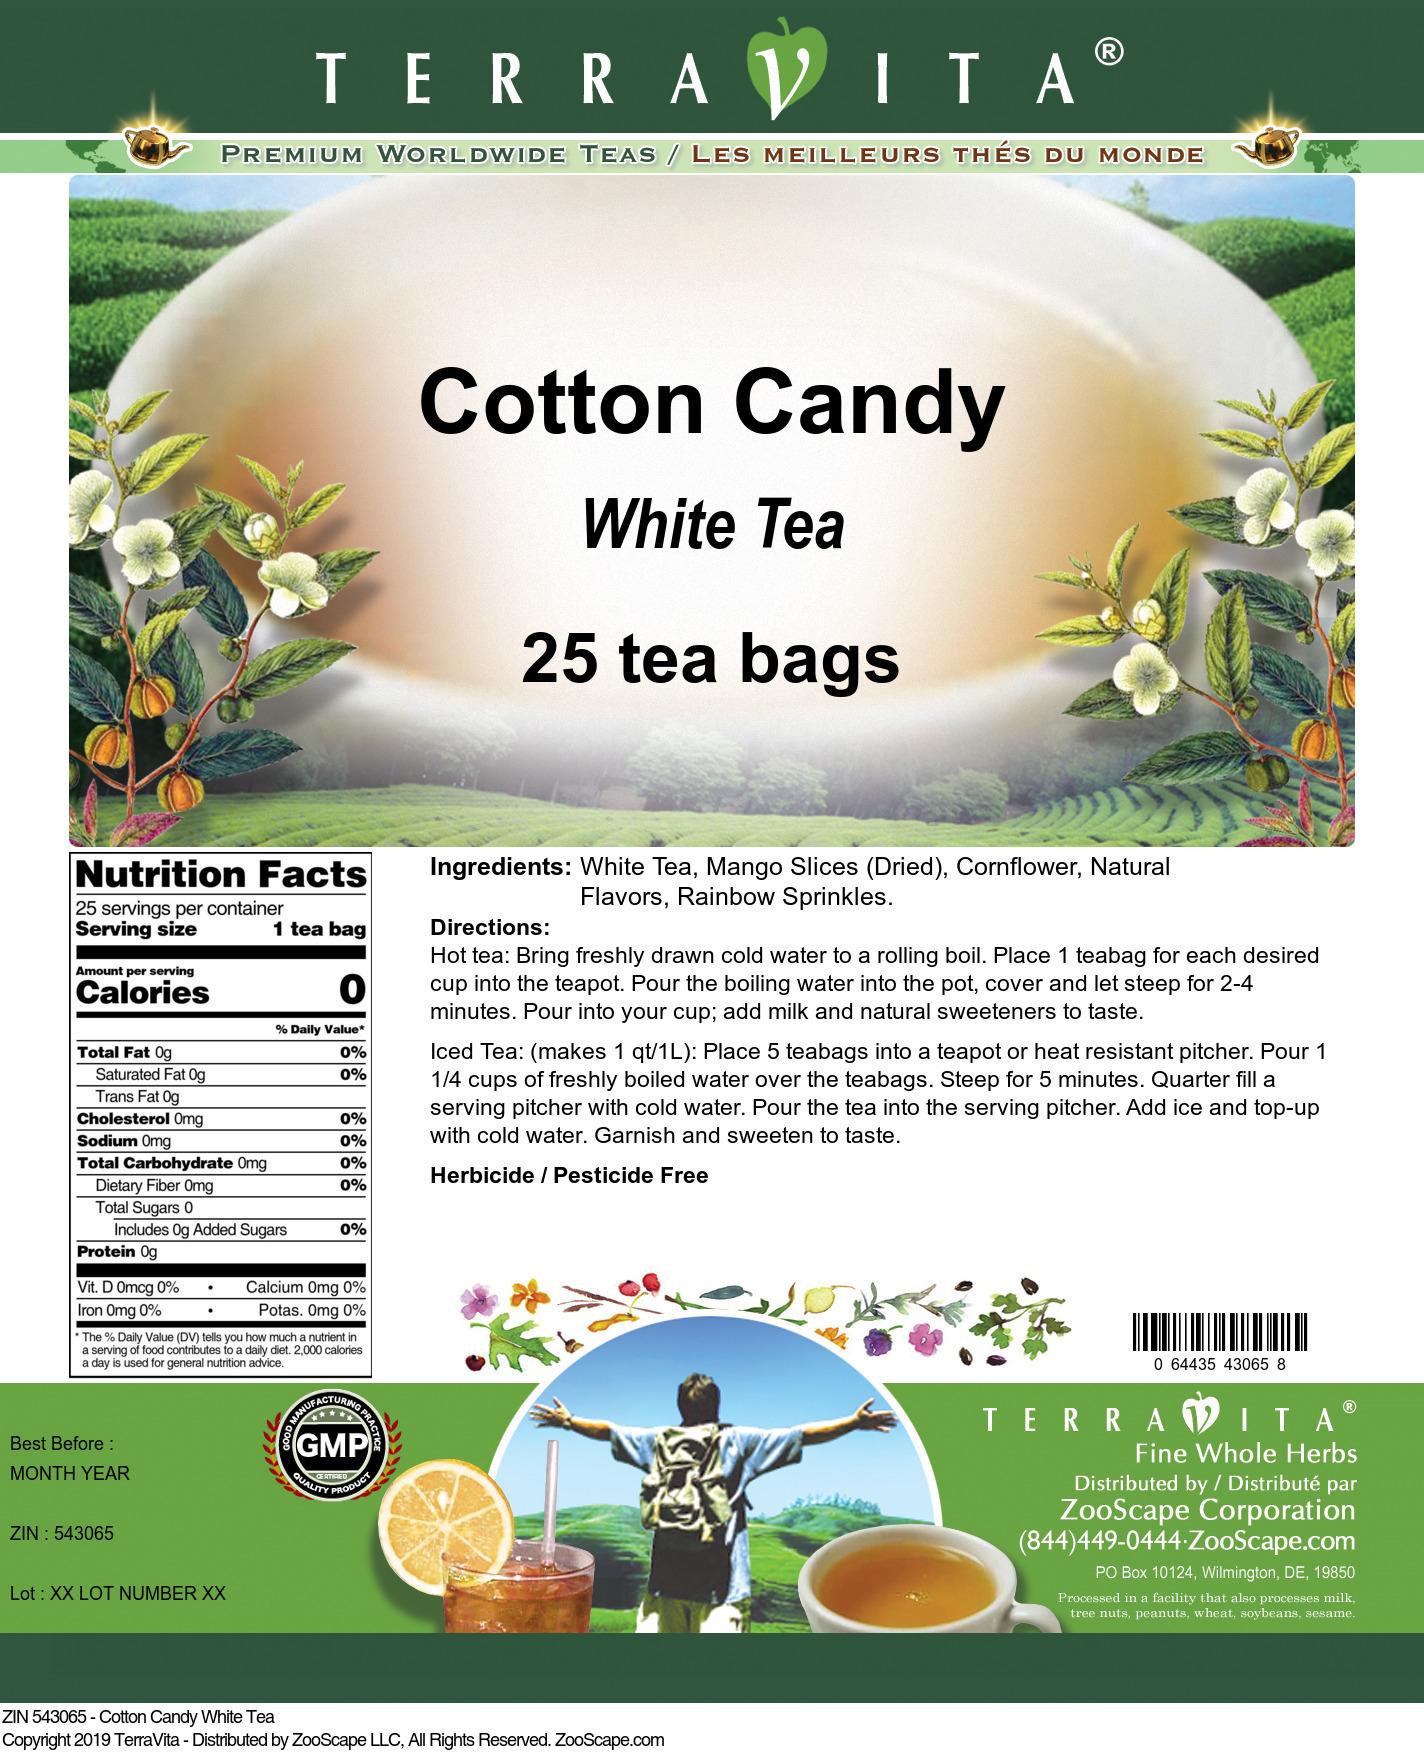 Cotton Candy White Tea